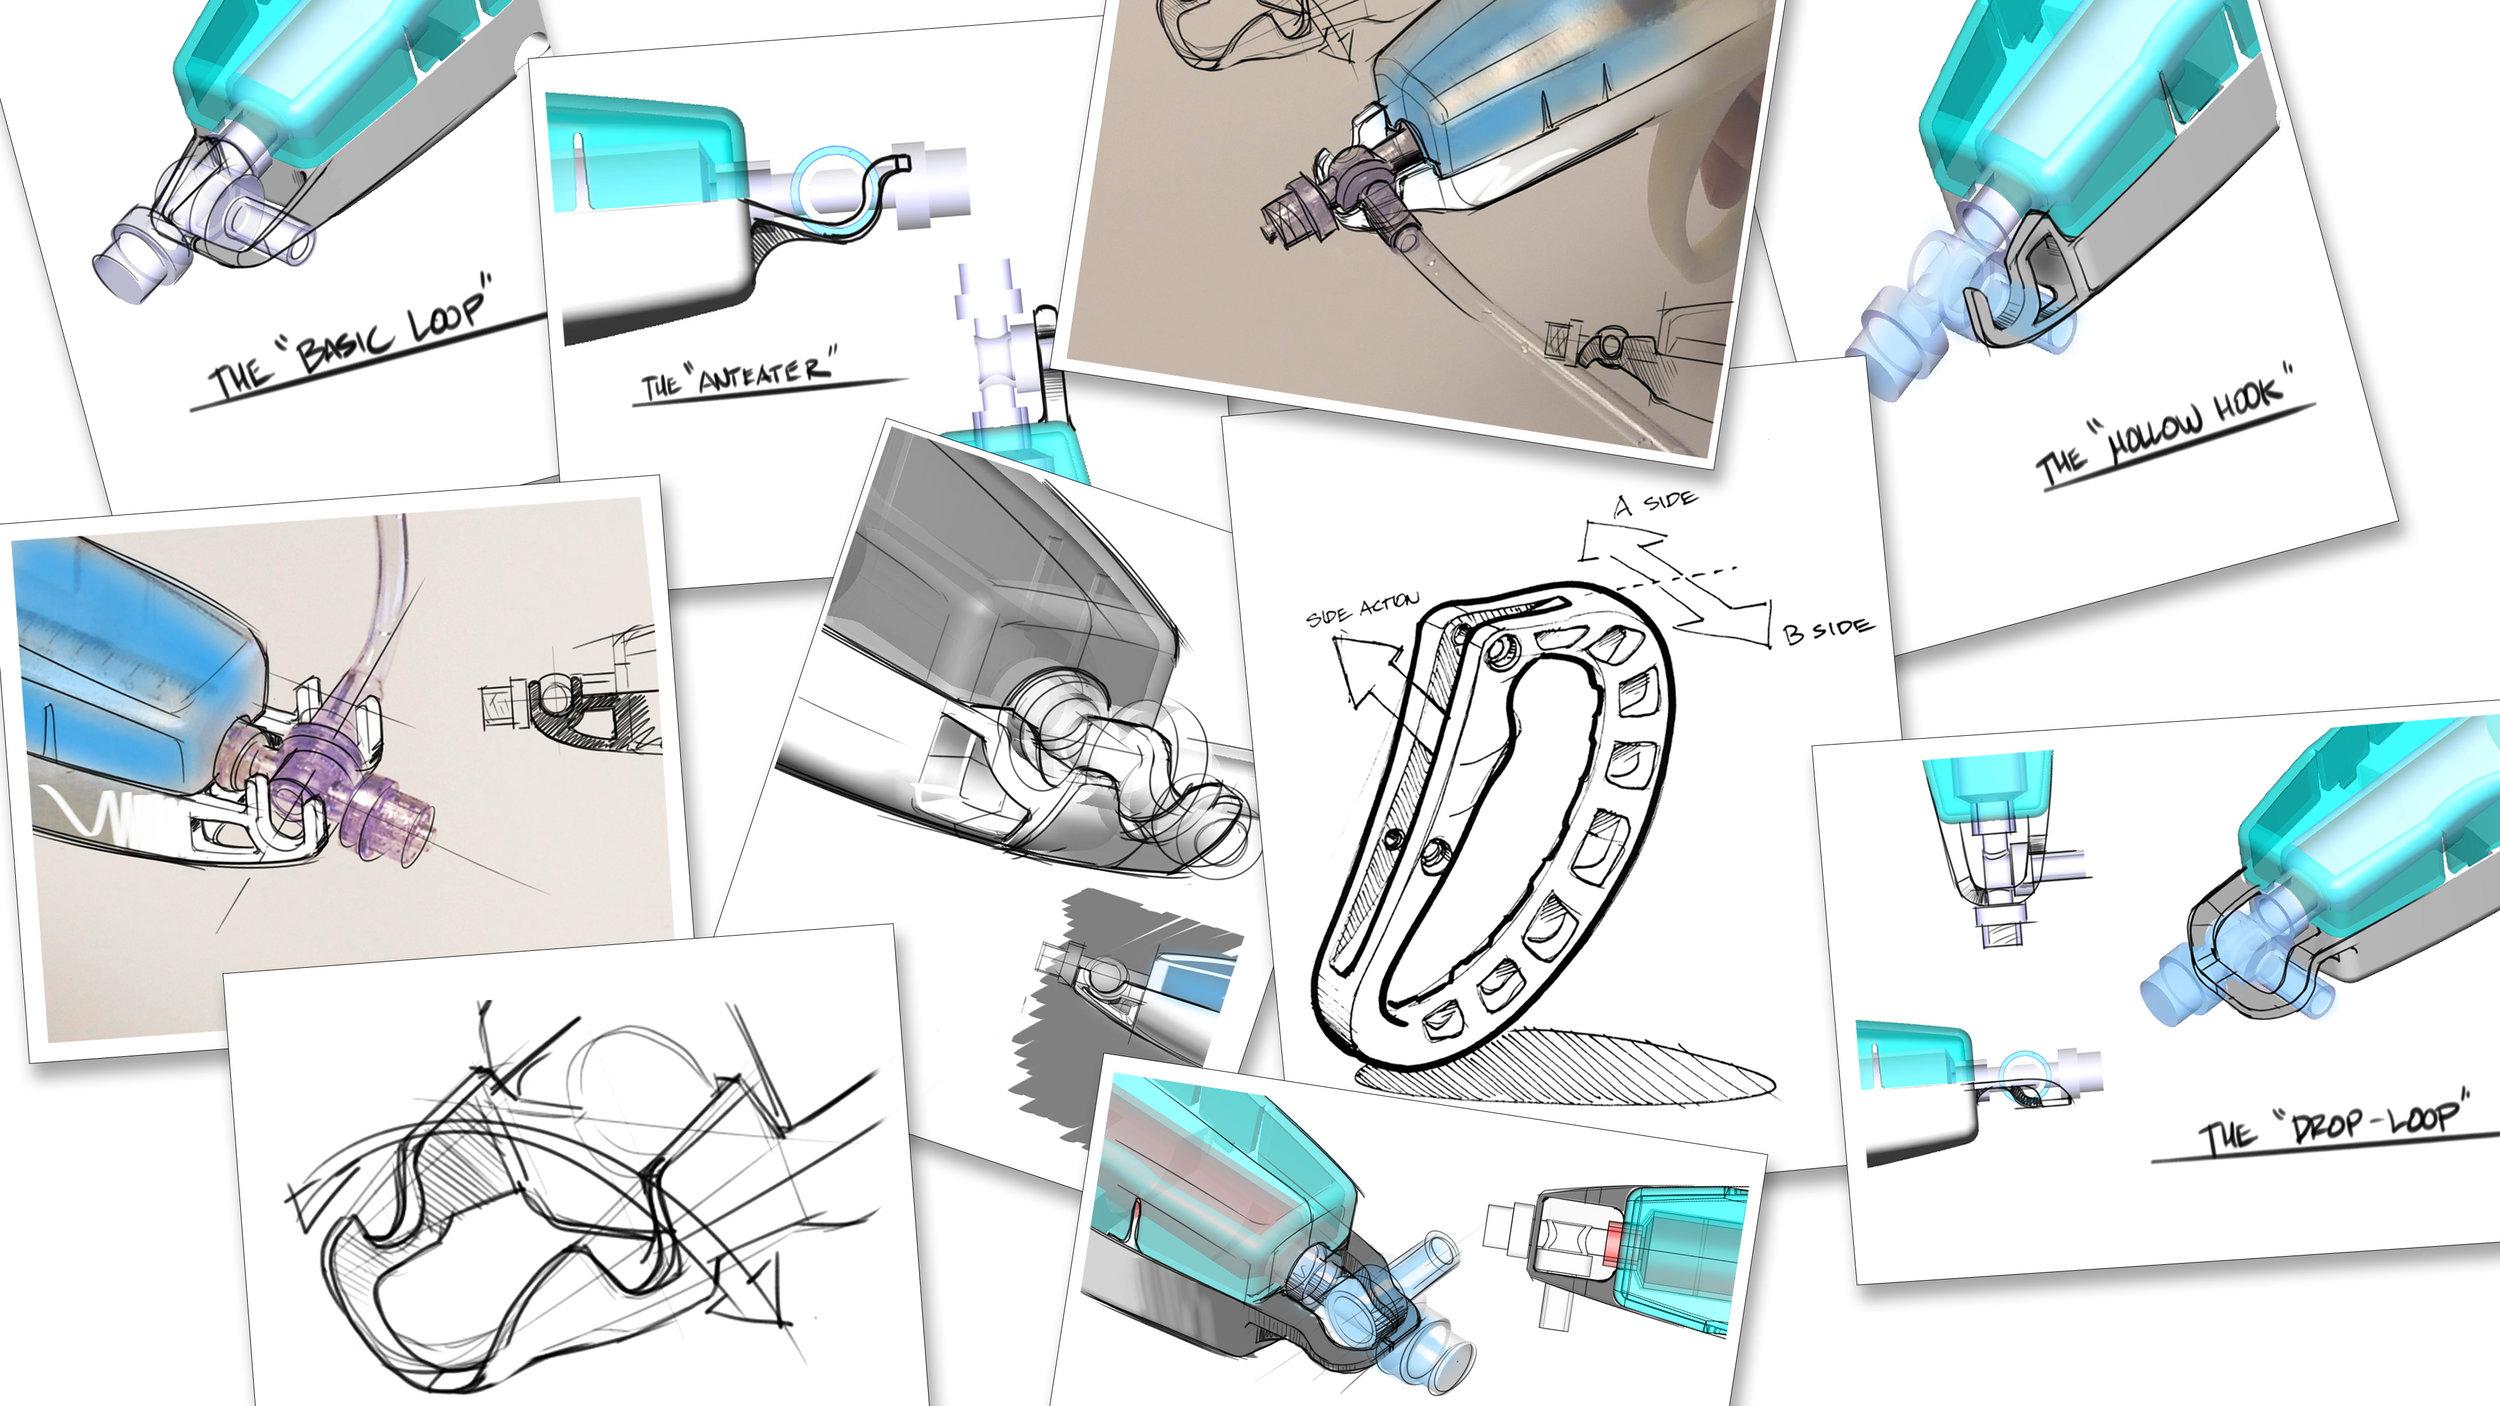 sketch mashup pages.jpg